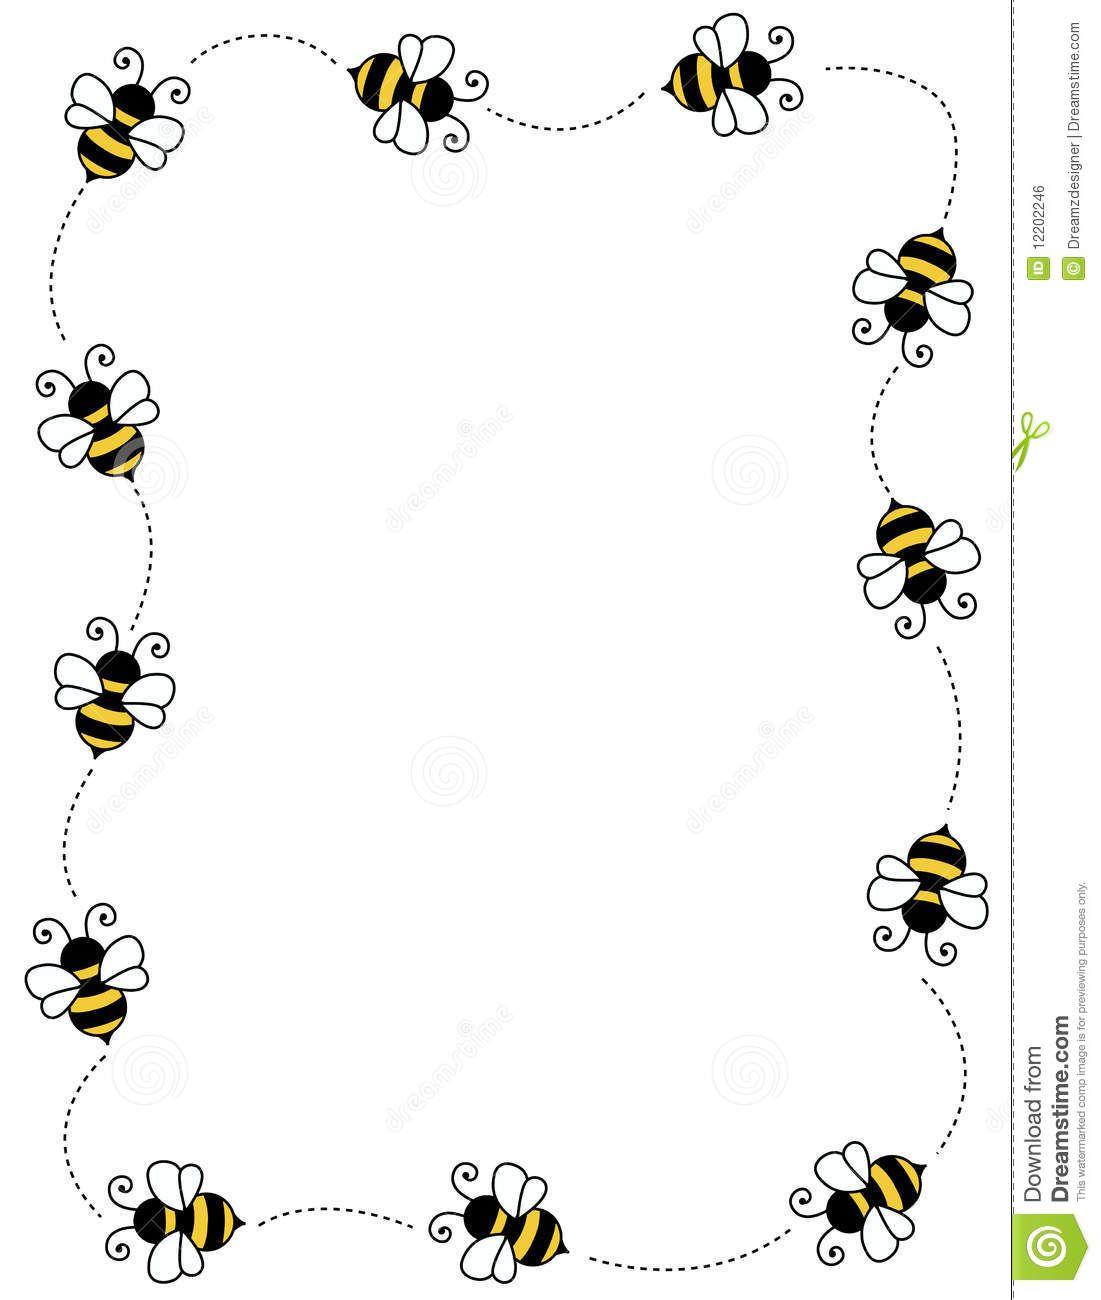 Pin On Bebe S Bees